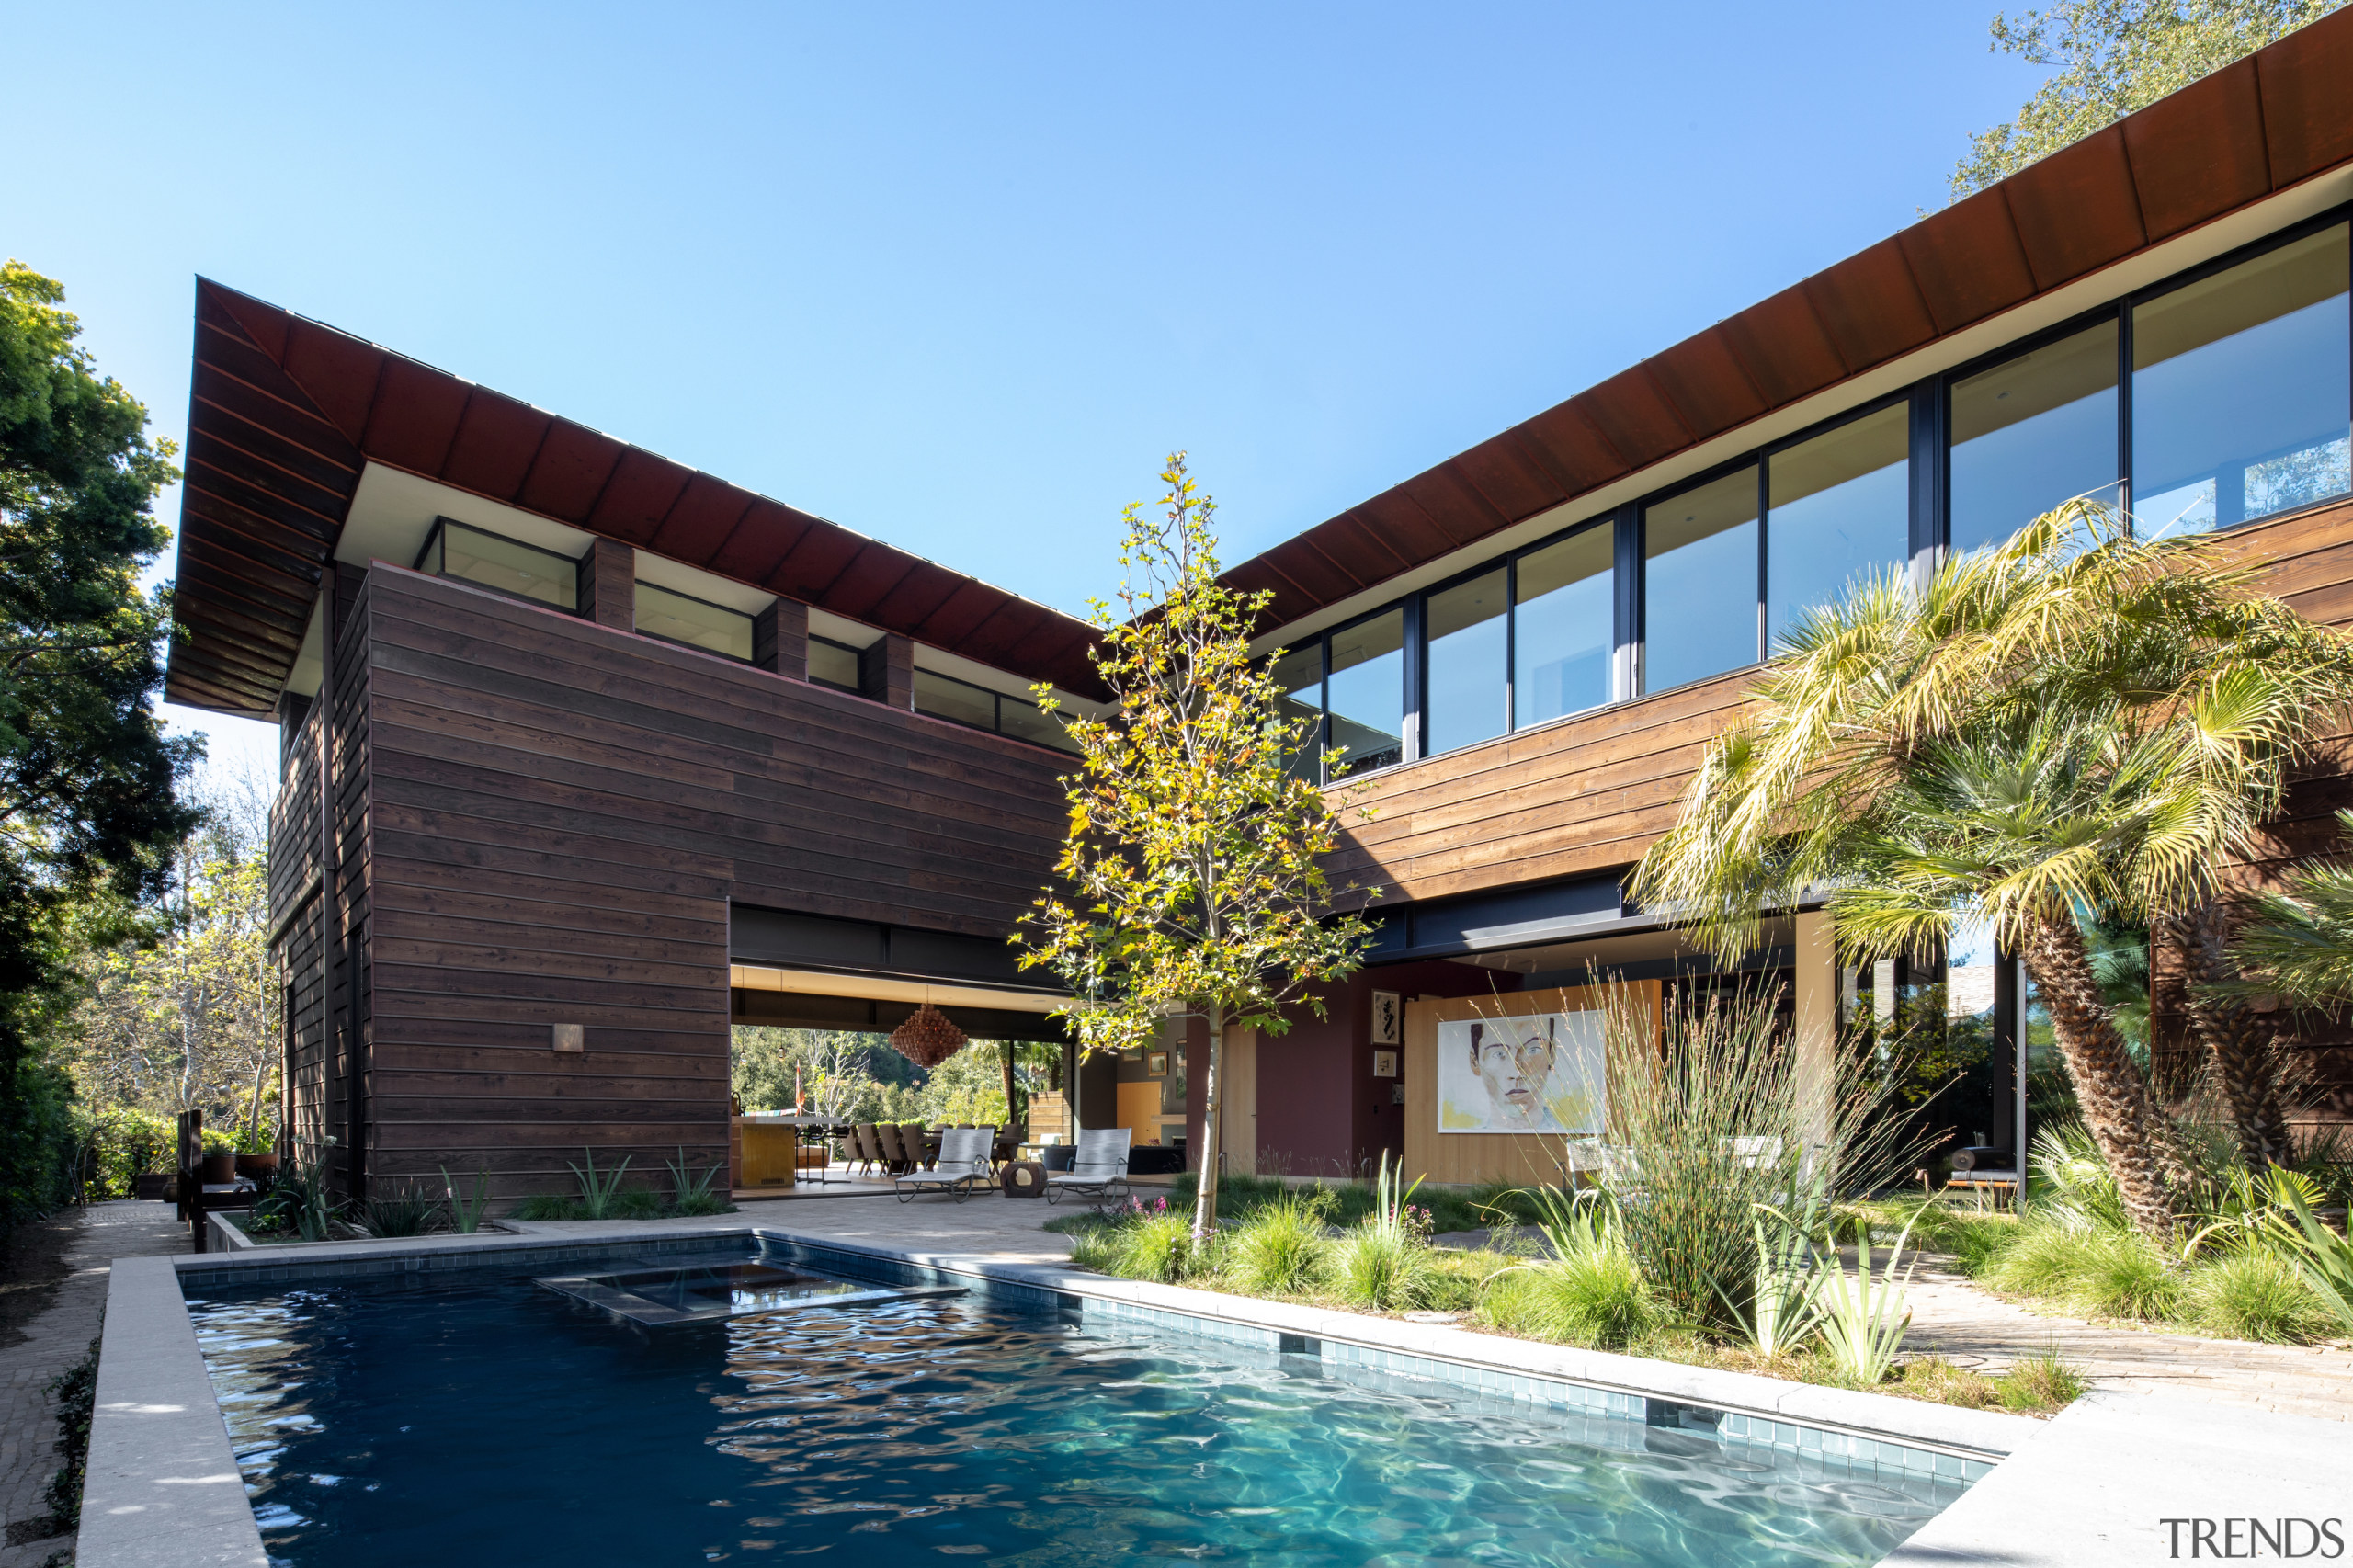 The pool features a Heath Ceramics tile border